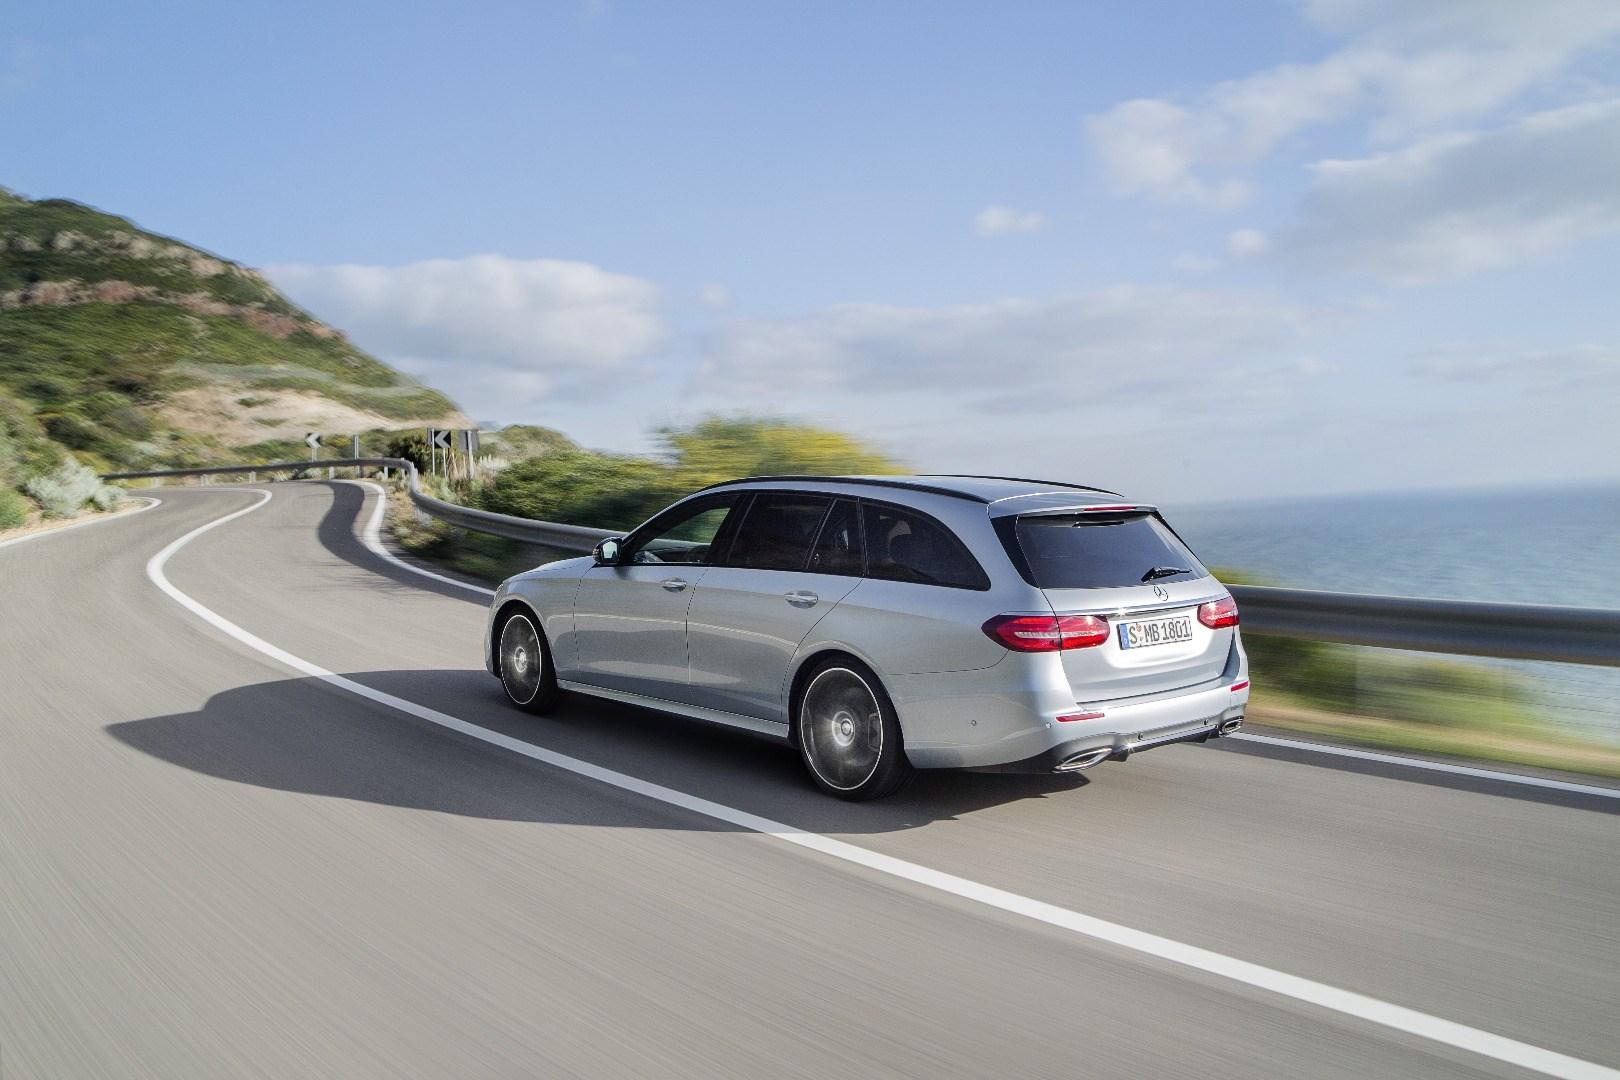 Mercedes-Benz E Class All Terrain To Debut In Paris Thumbnail